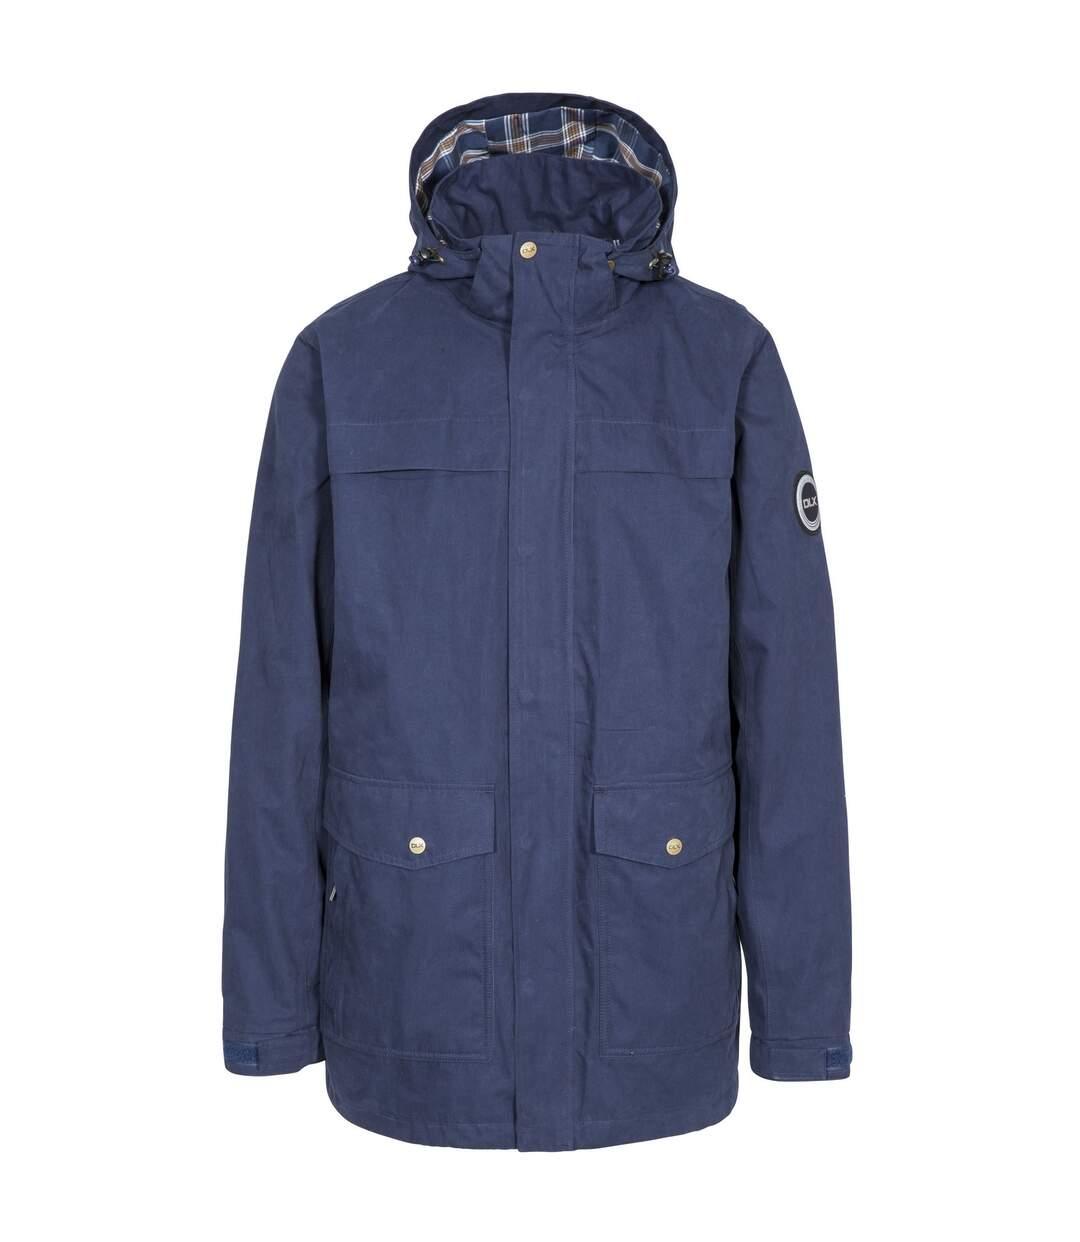 Trespass Mens Rowland Waterproof Jacket (Navy) - UTTP4612